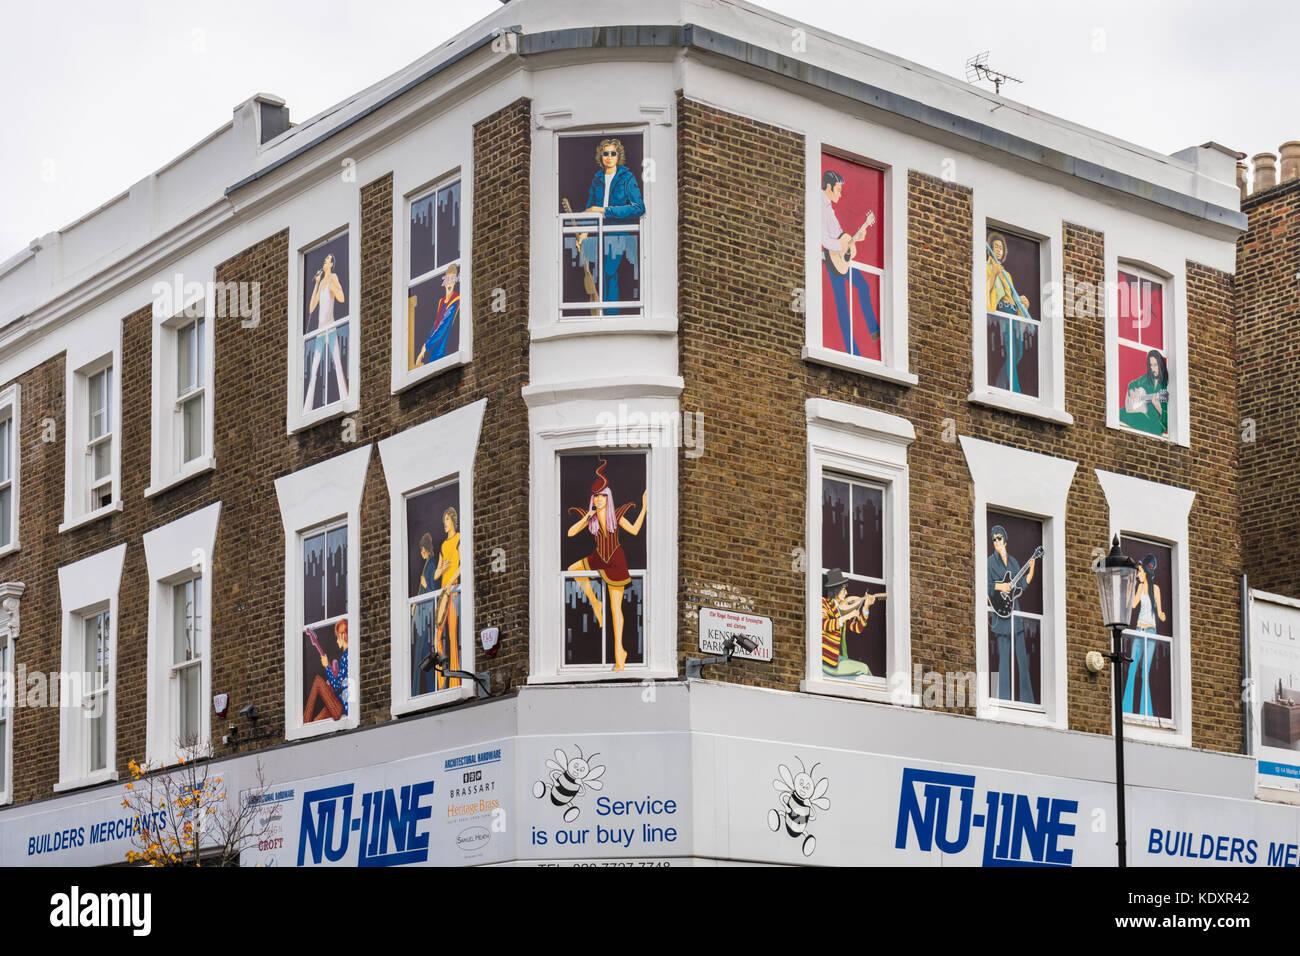 Best Art House Kensington Place 2020 @KoolGadgetz.com